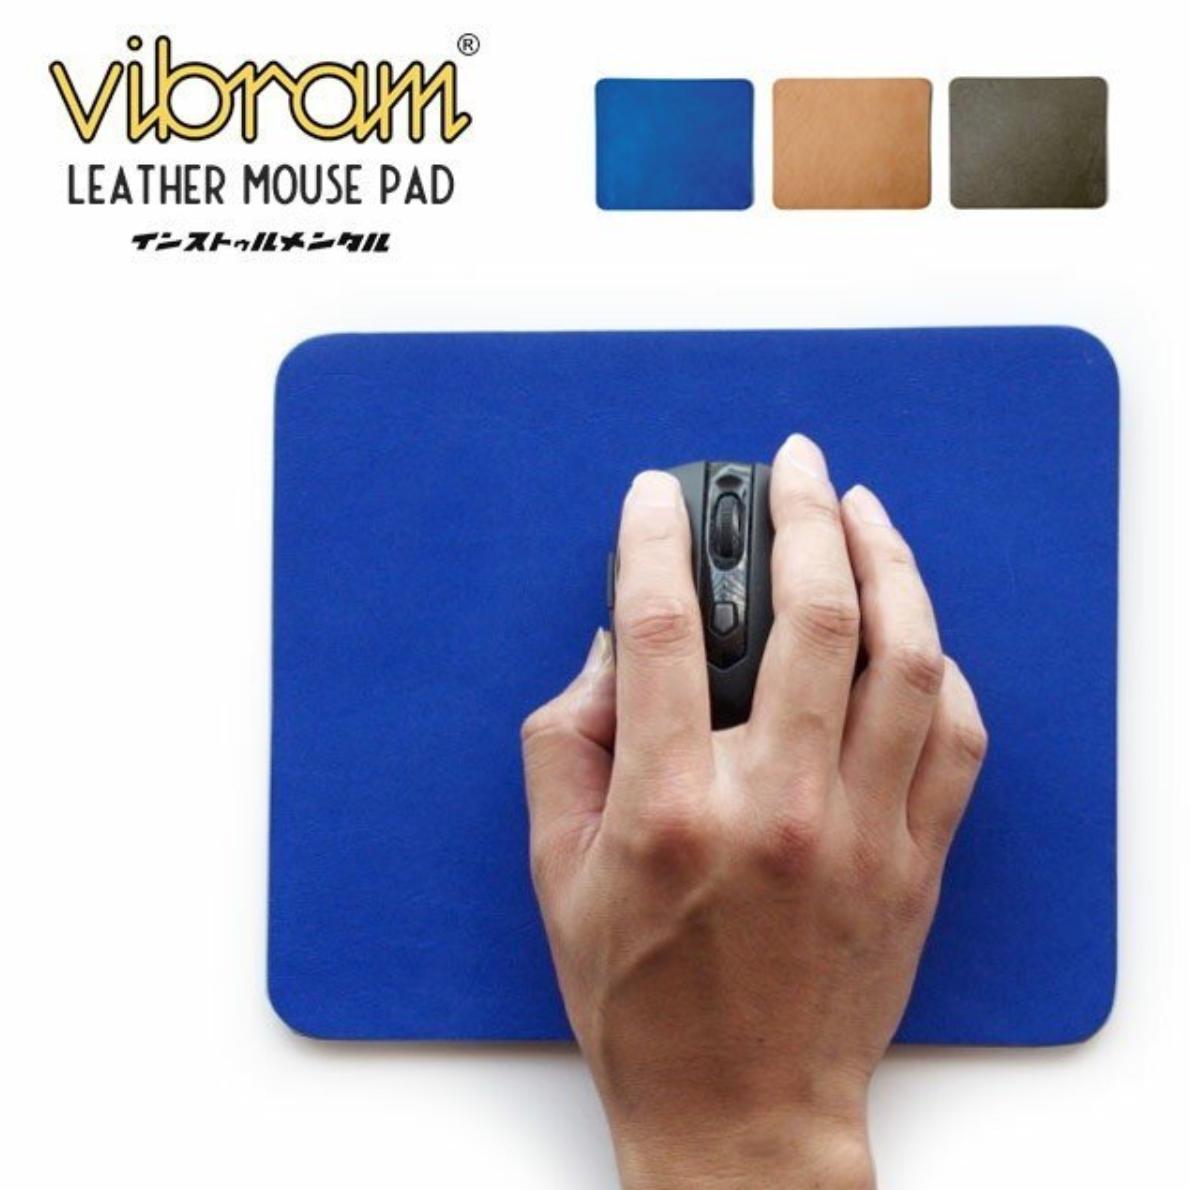 Vibram × レザーマウスパッド instrumental